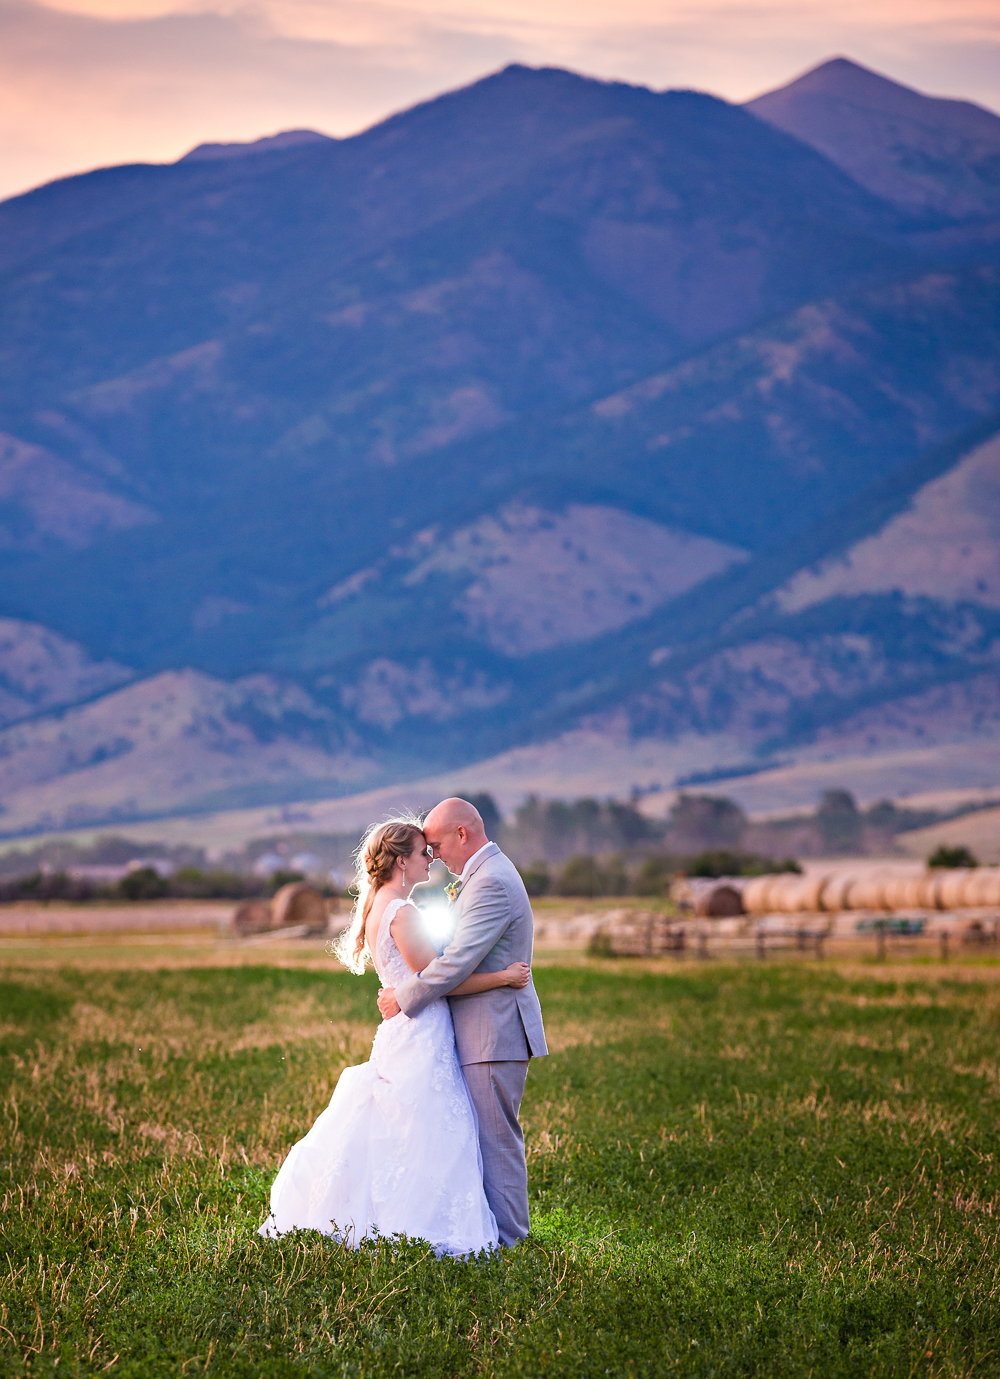 bozeman-montana-wedding-roys-barn-sunset-photo-bridger-mountains.jpg